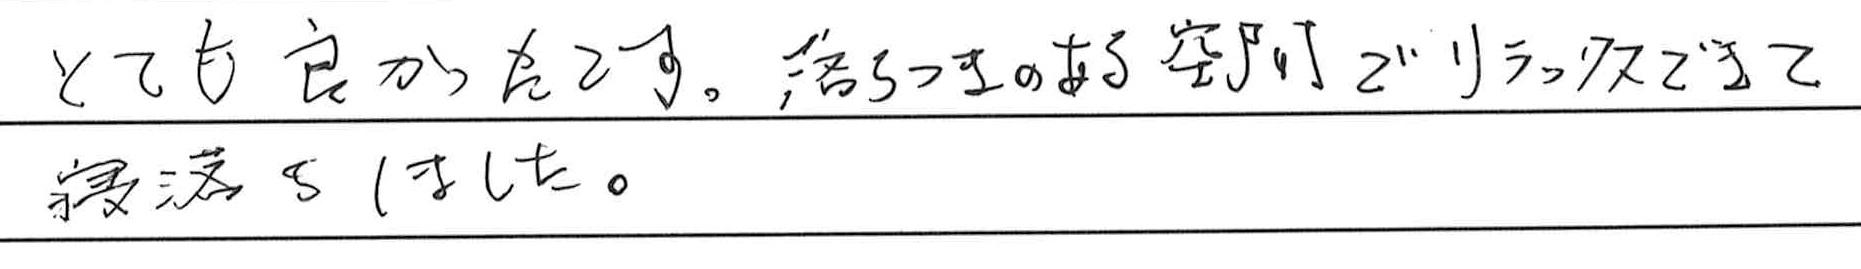 sakuo様のご感想